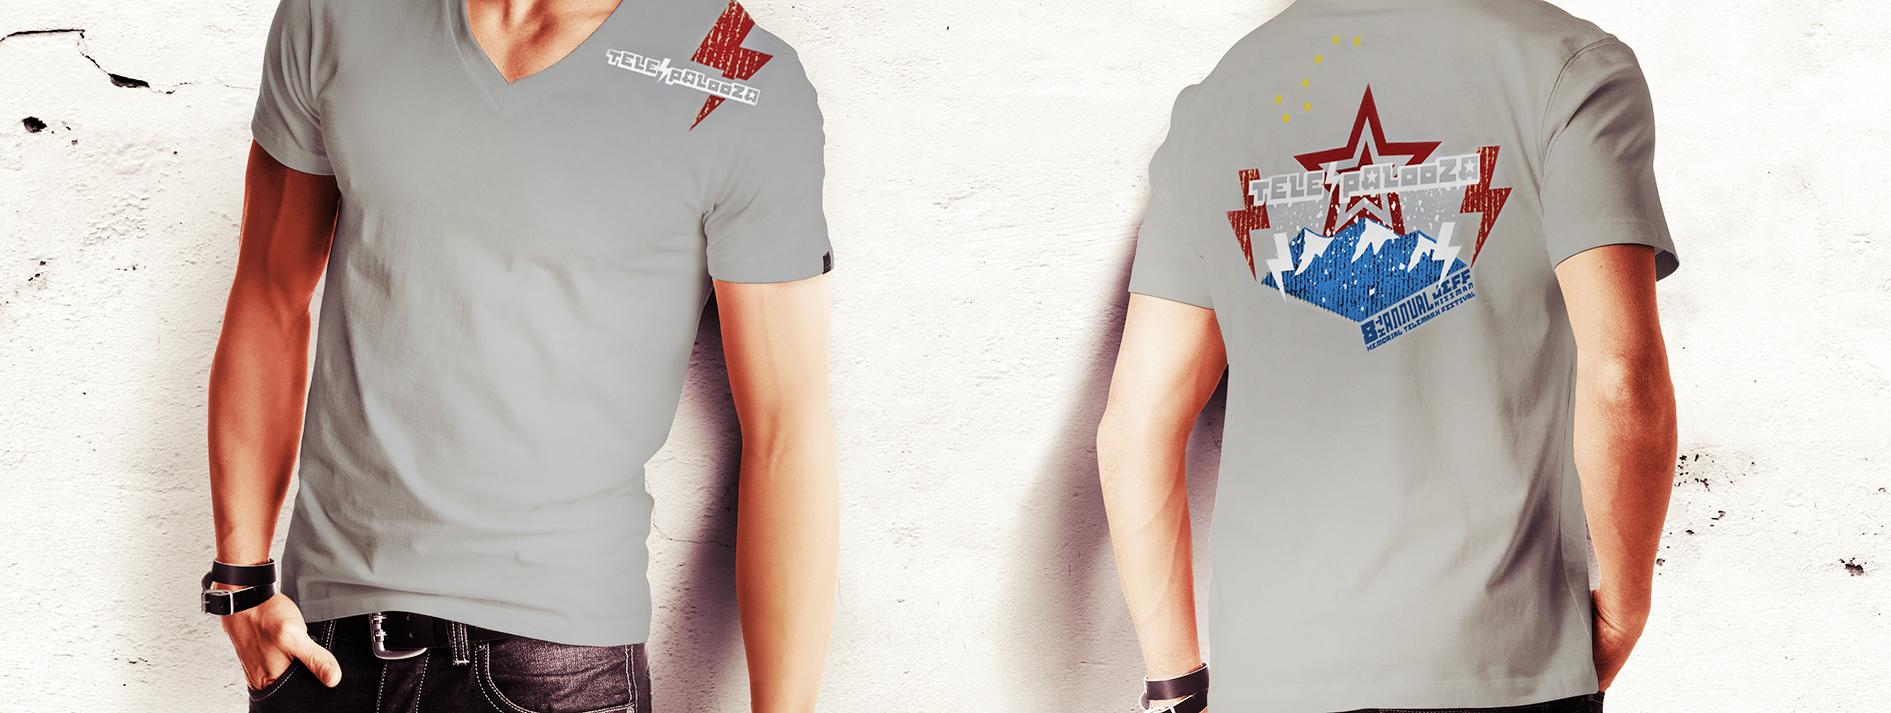 Telepolooza Music Festival T-Shirt